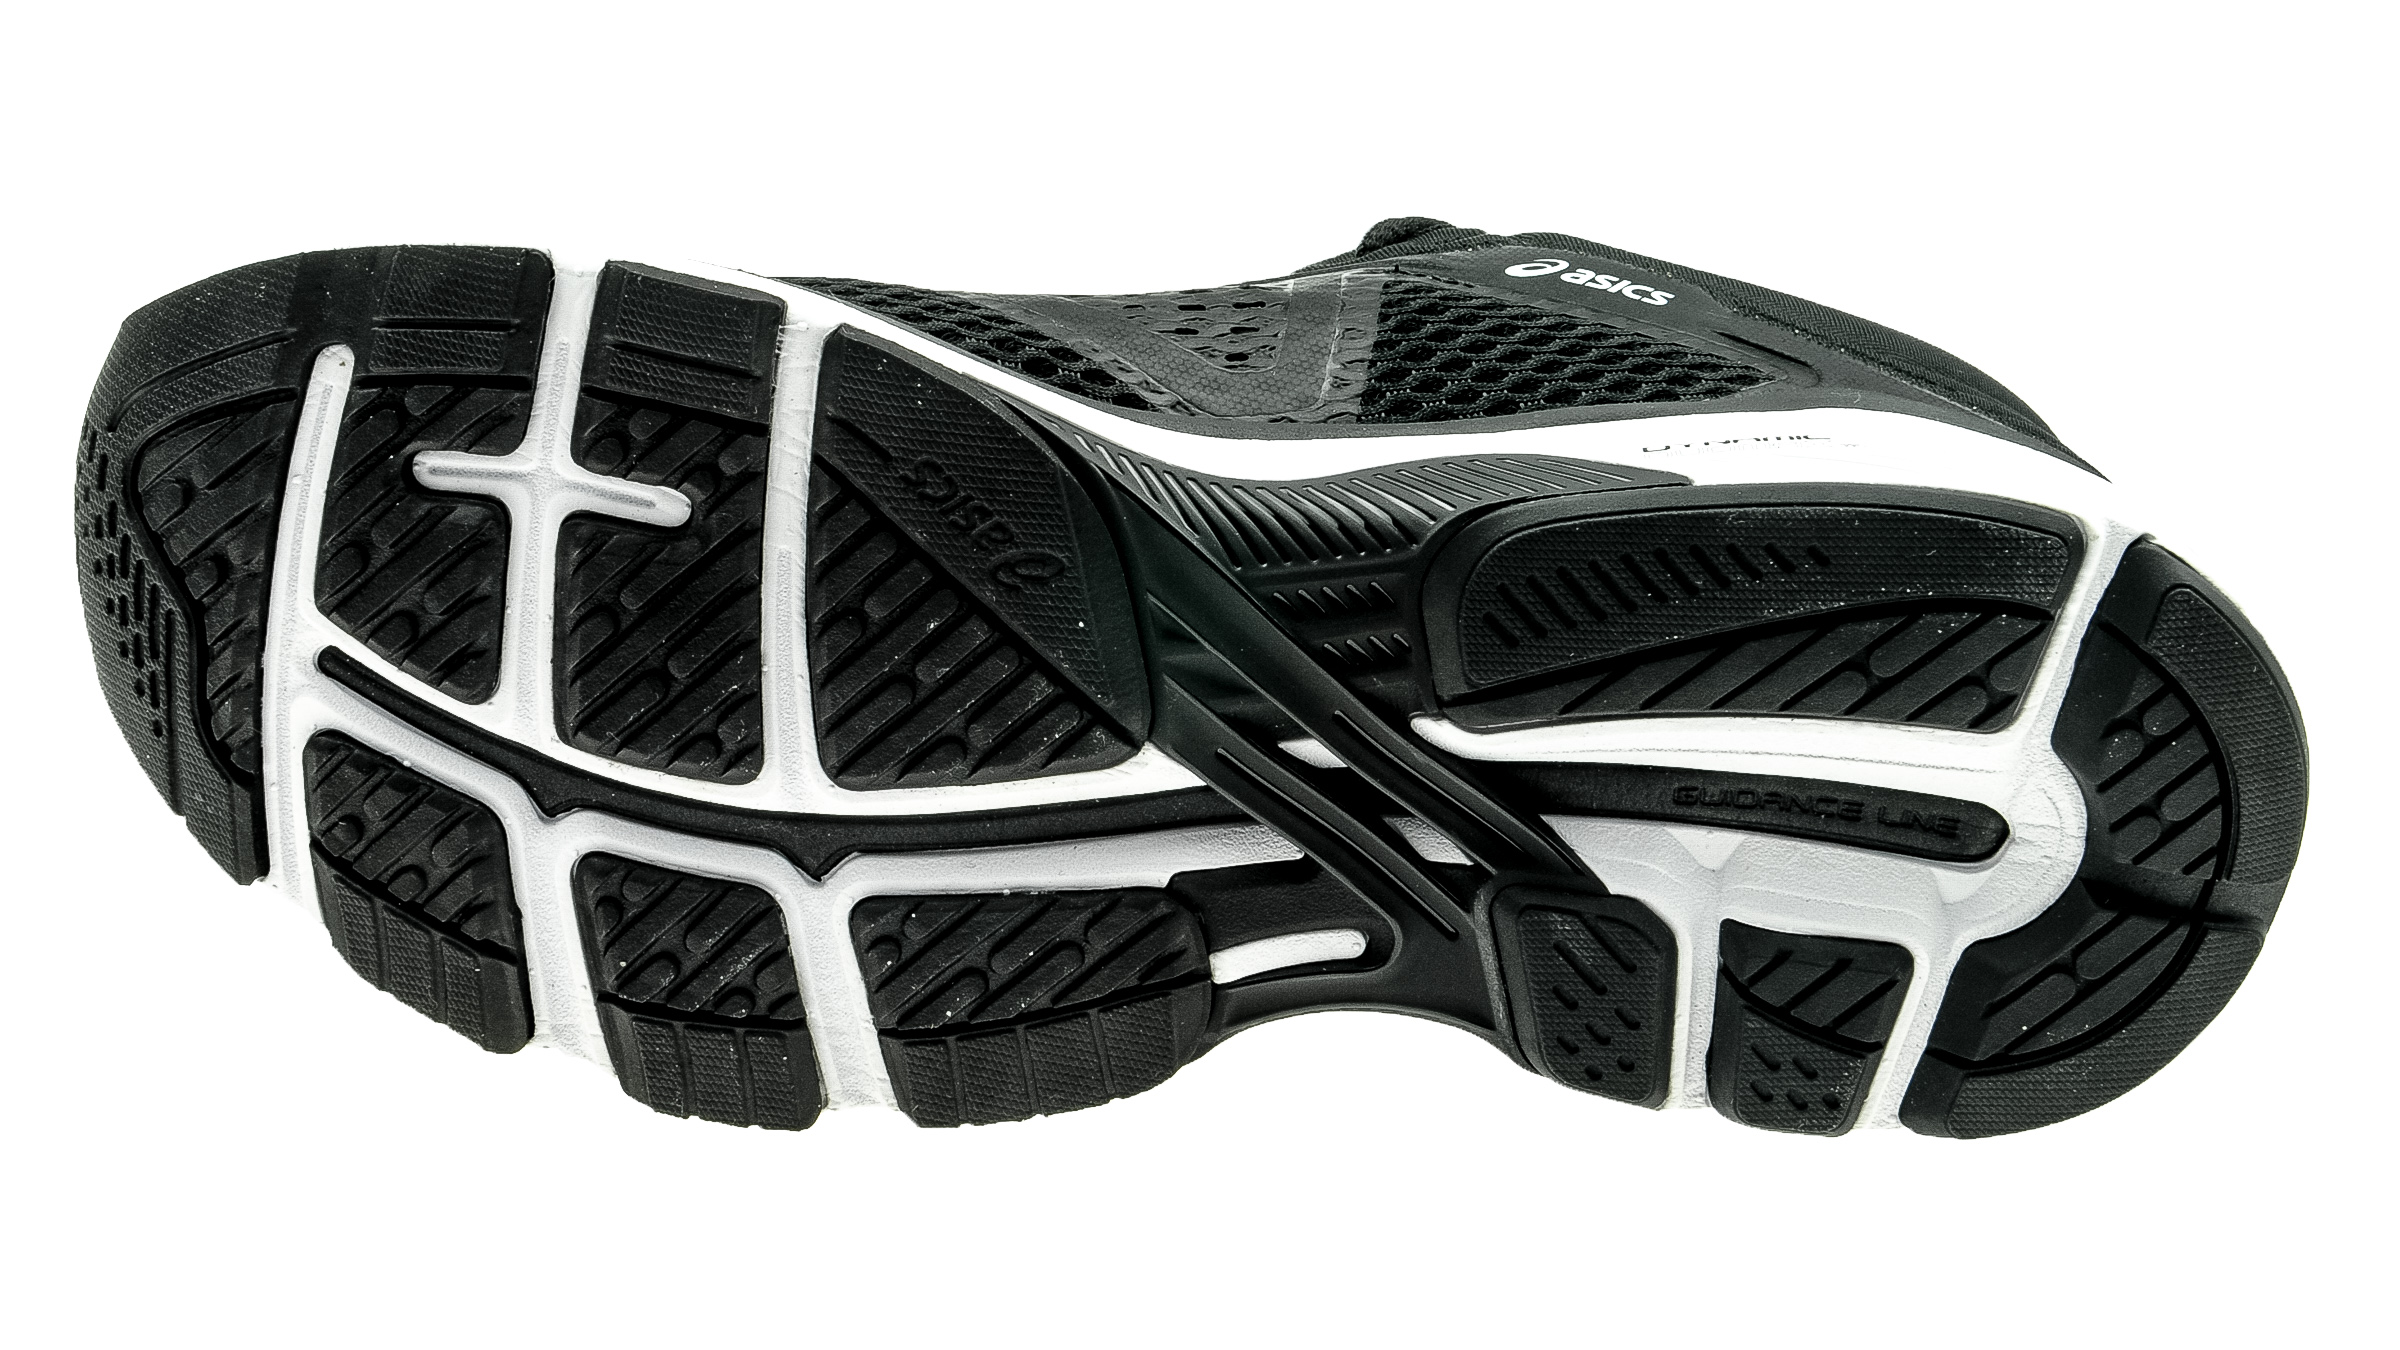 Asics GT 2000 6 6 noir/ blanc blanc/ 16610 carbone bestellen bij Skate d5b0da3 - vendingmatic.info